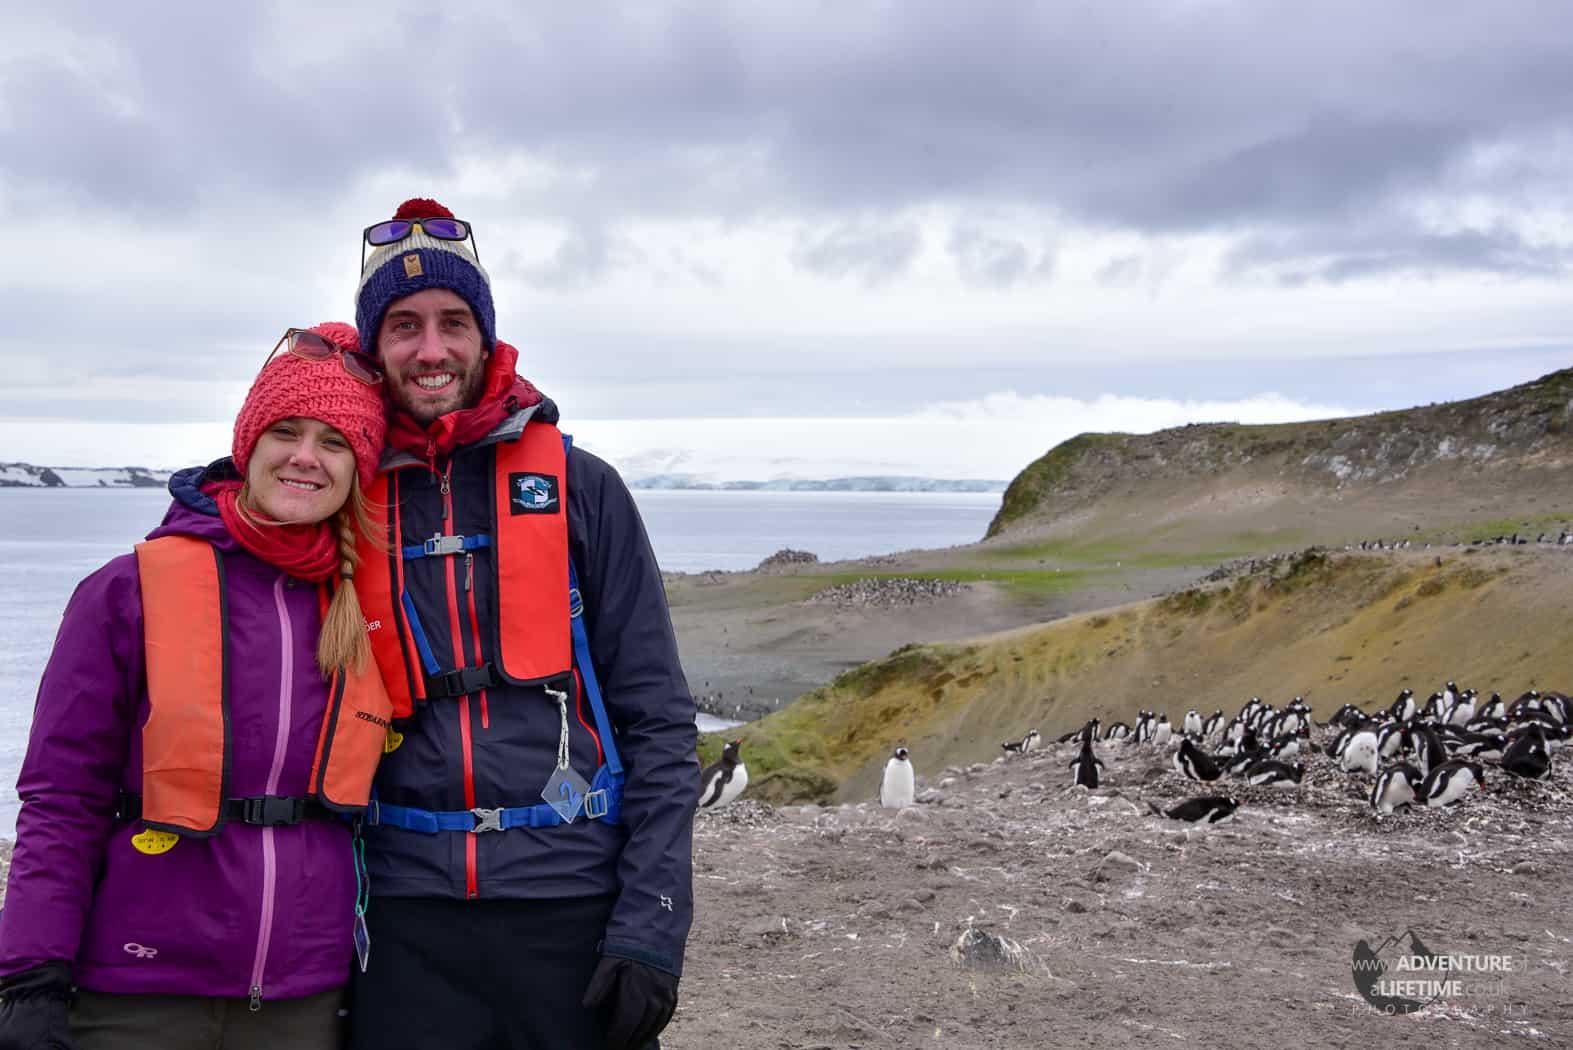 Michael and Dora on Antarctica